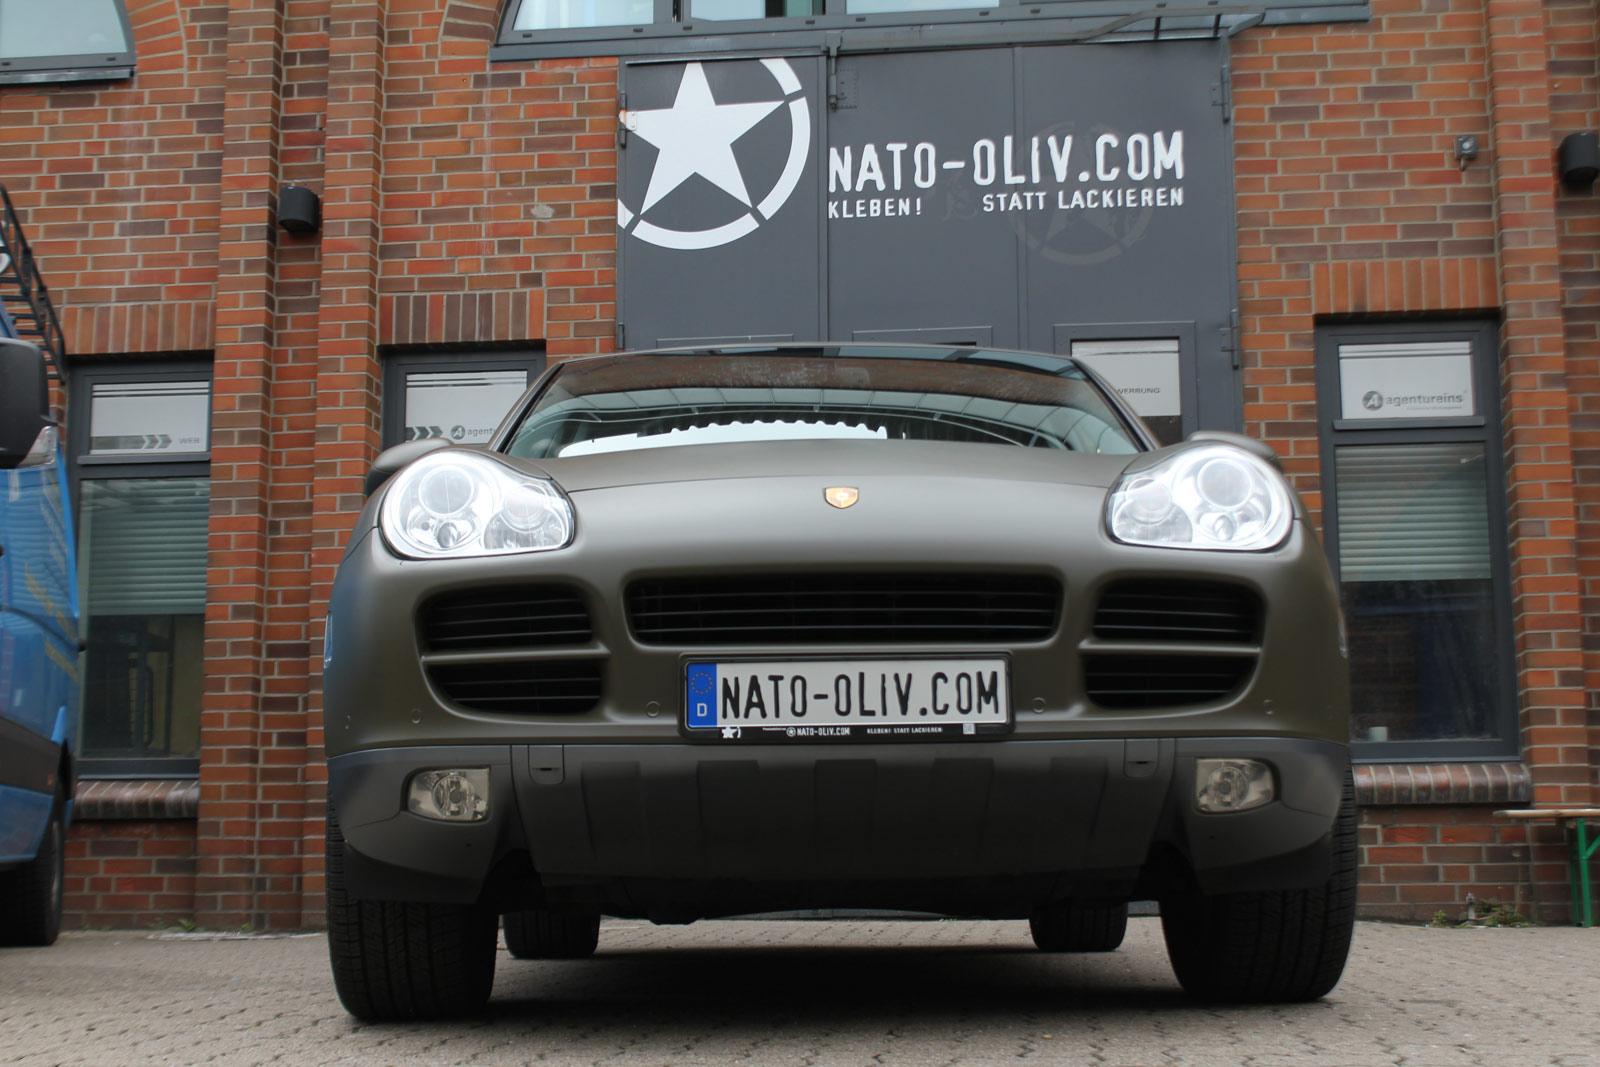 Porsche_Cayenne_Folierung_Nato-Oliv_Matt_13